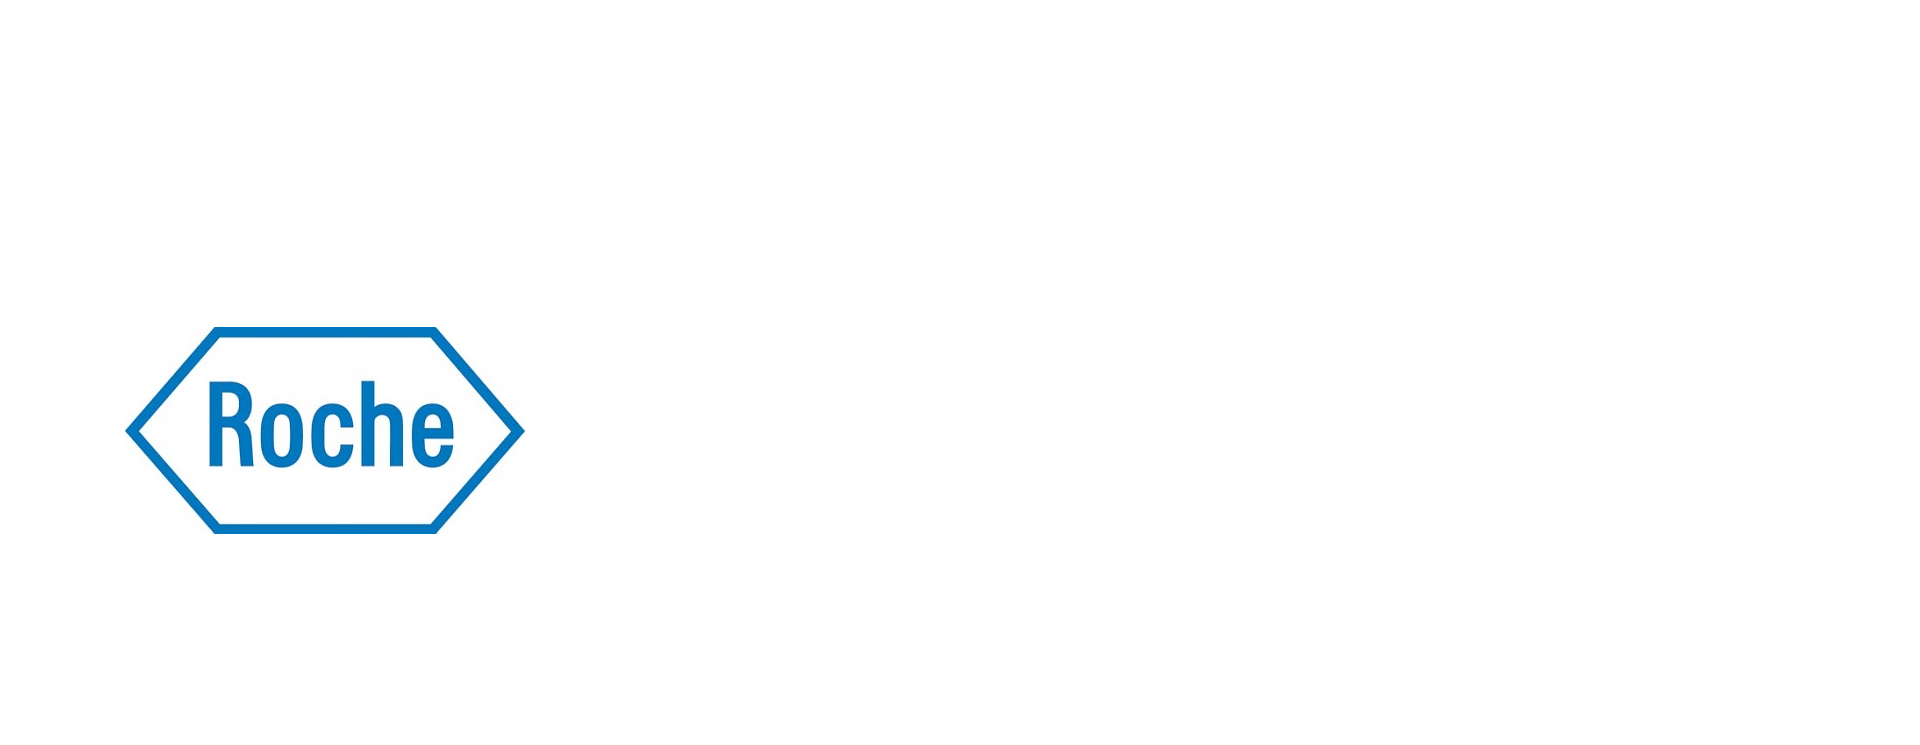 Roche Diagnostics Logo Meldung